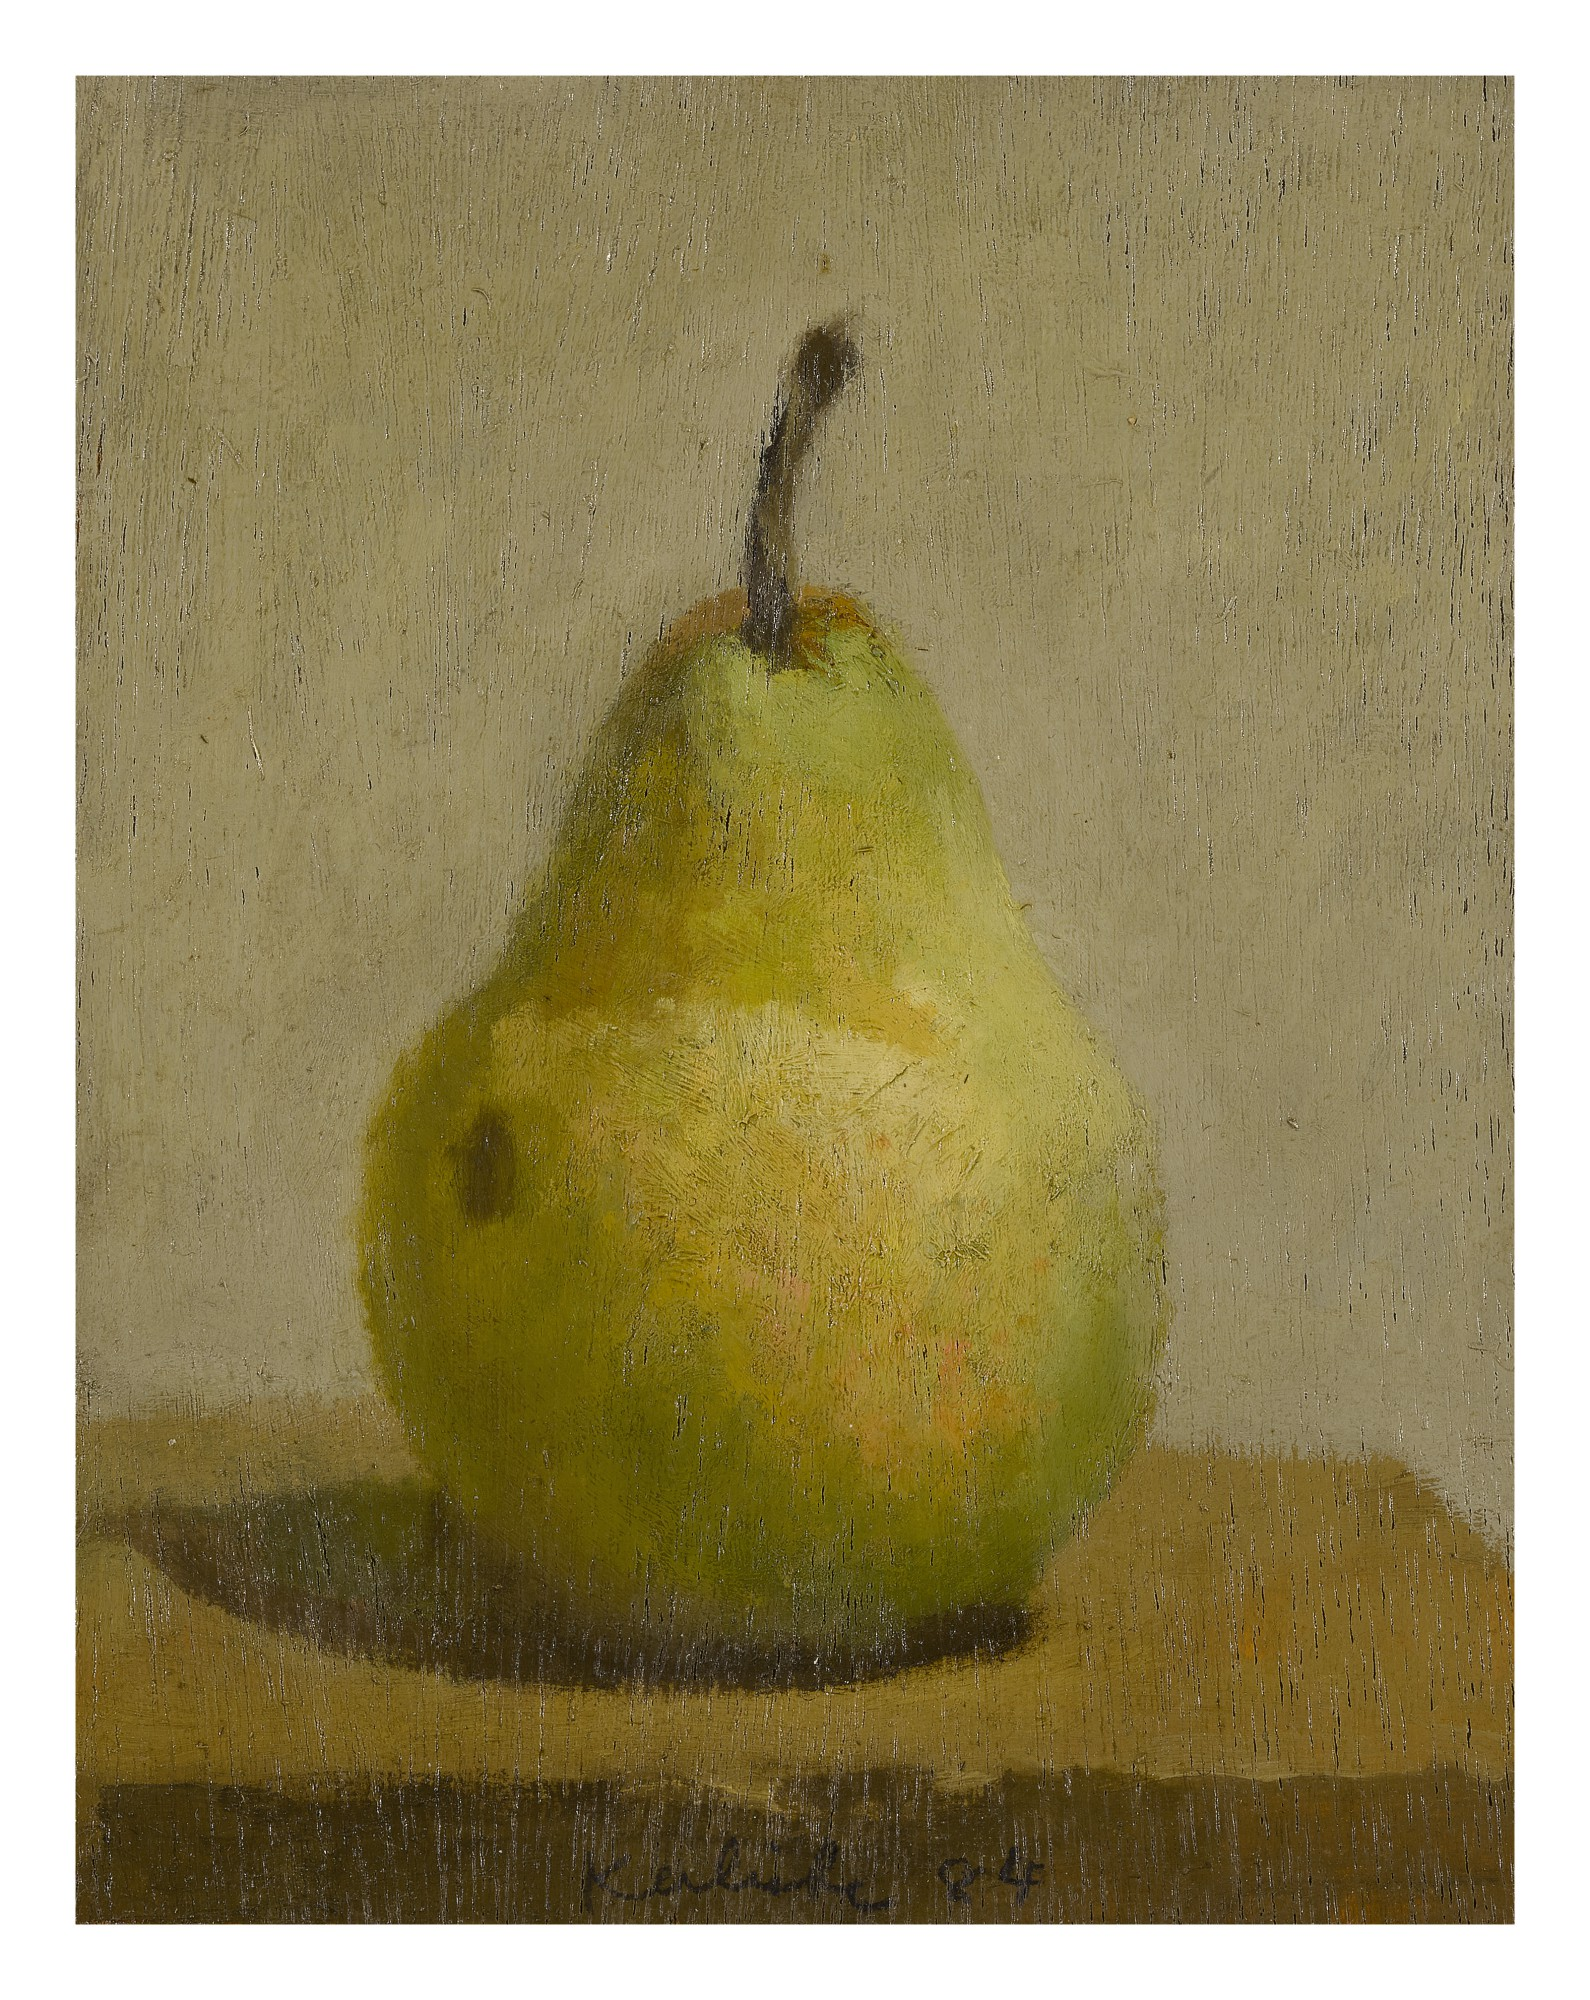 ROBERT M. KULICKE | SINGLE YELLOW-GREEN PEAR